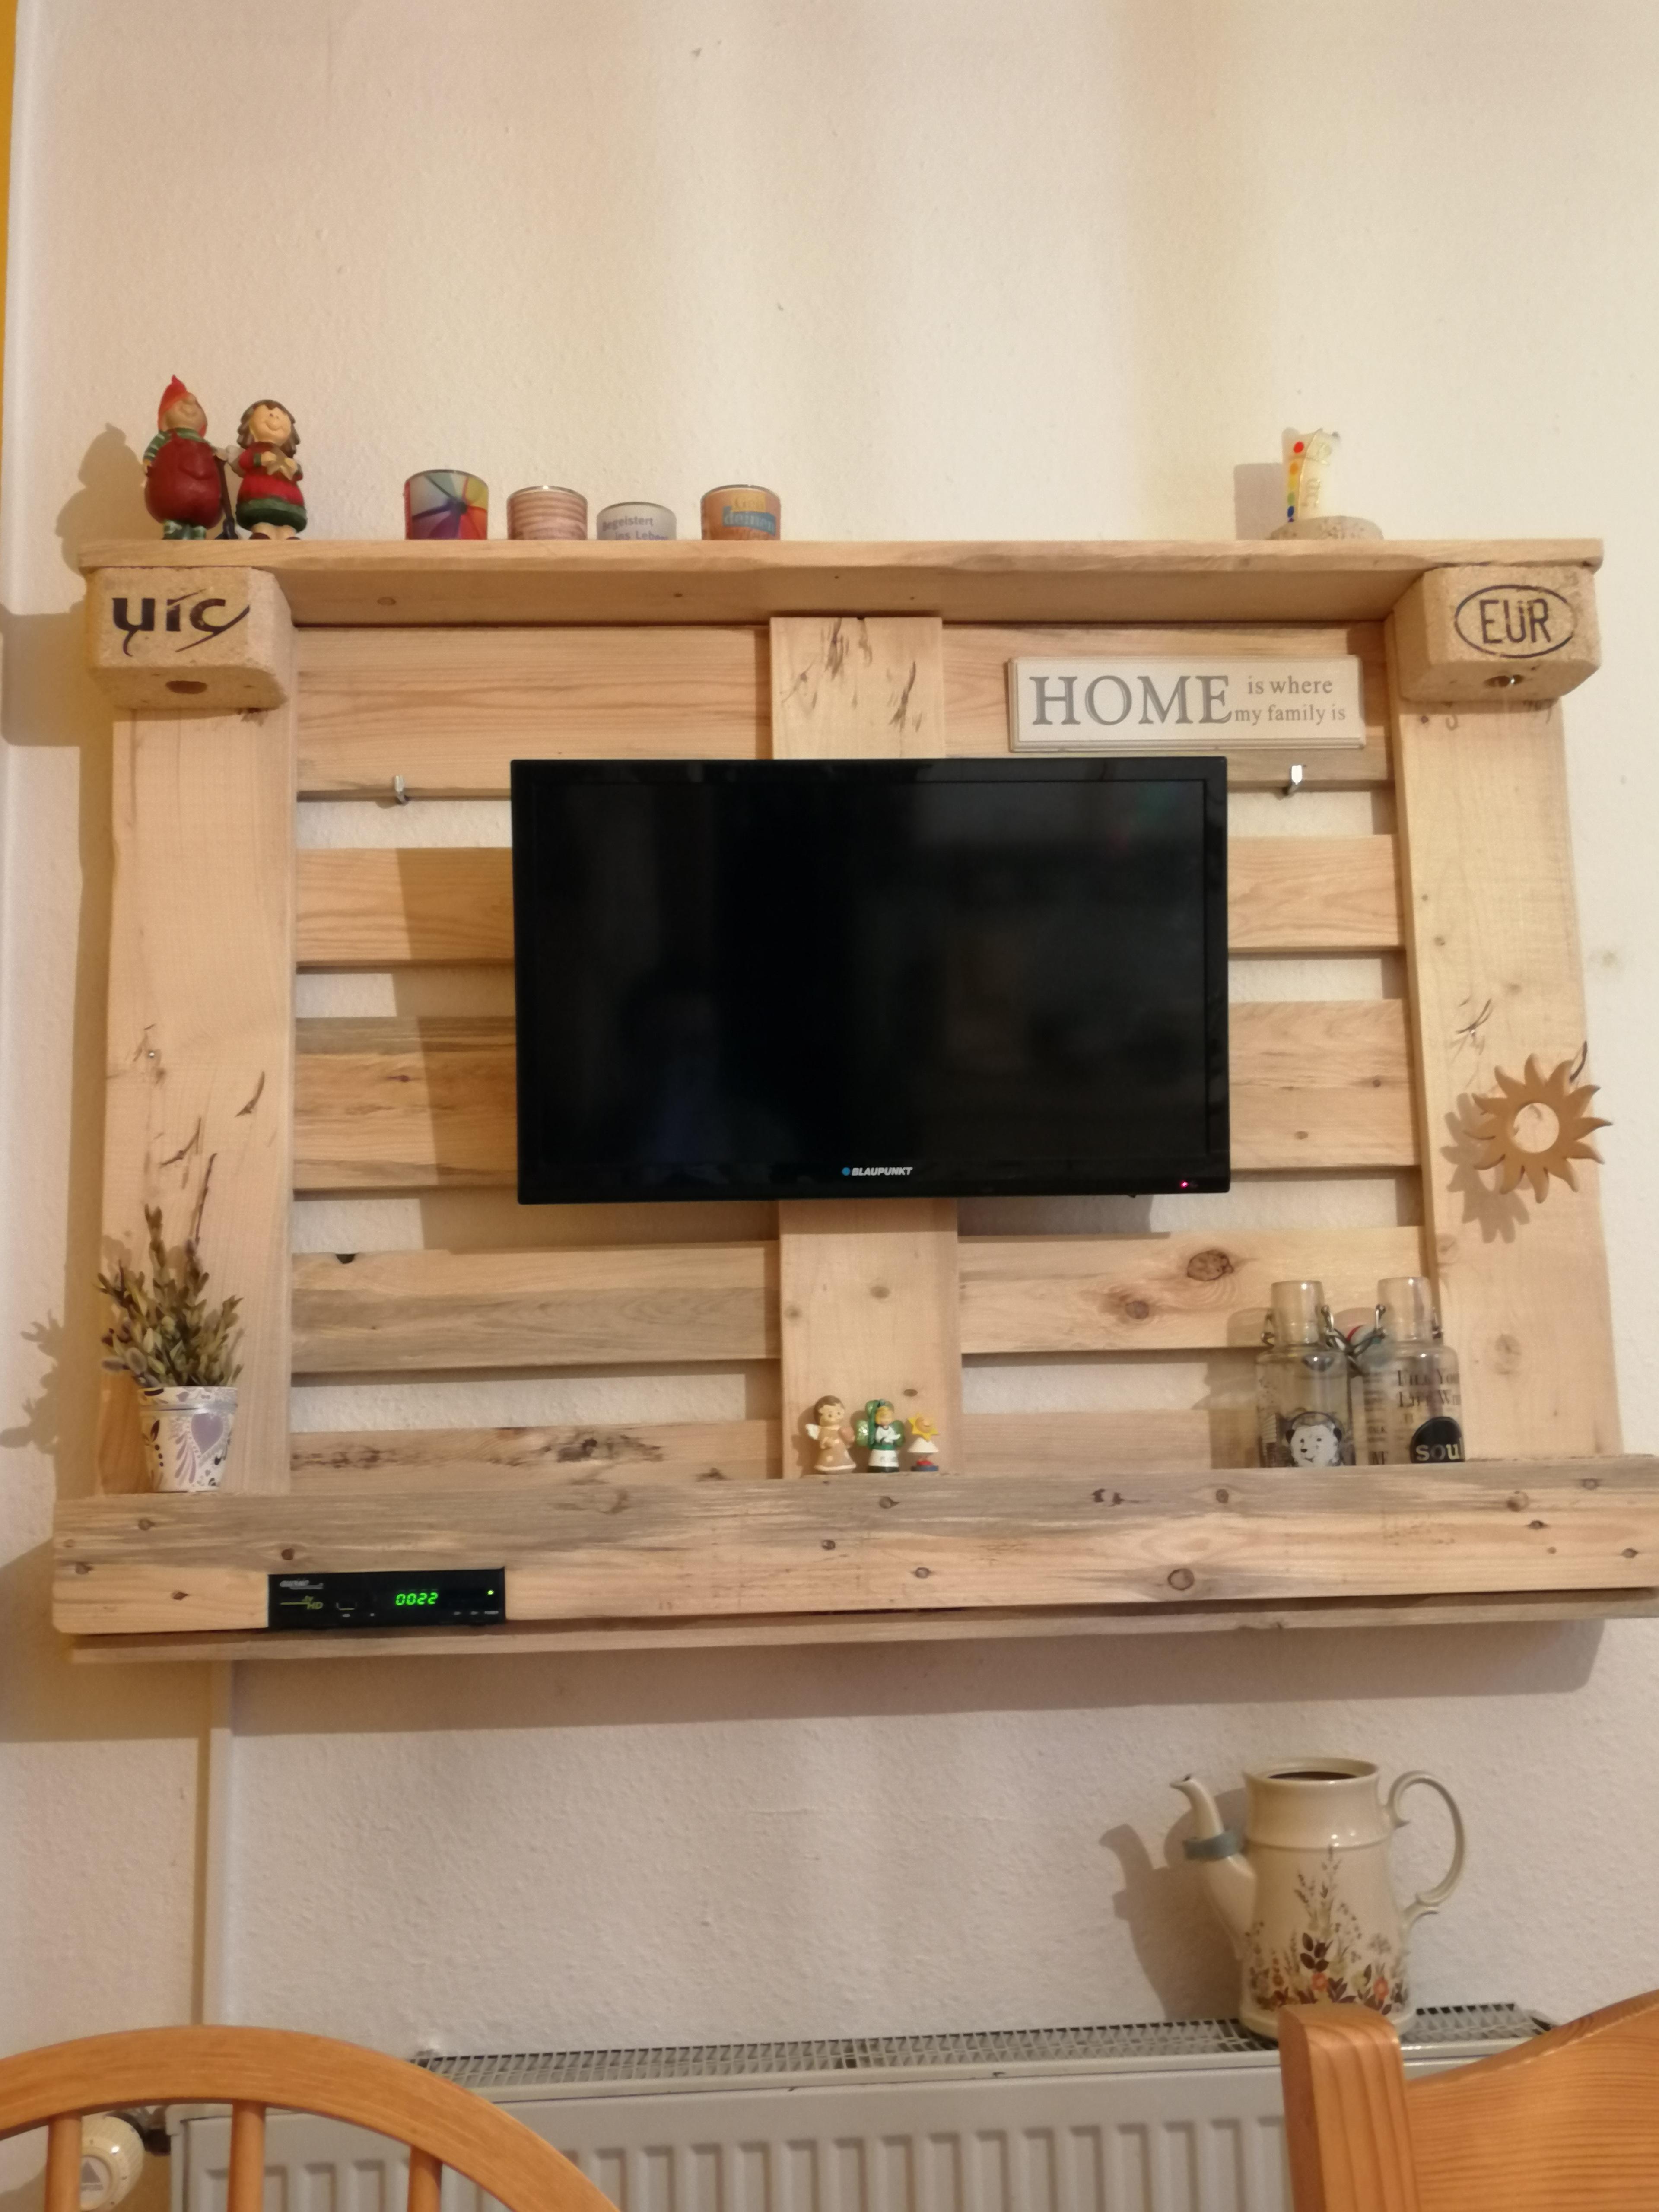 Palettenmöbel: Starte dein DIY-Projekt!